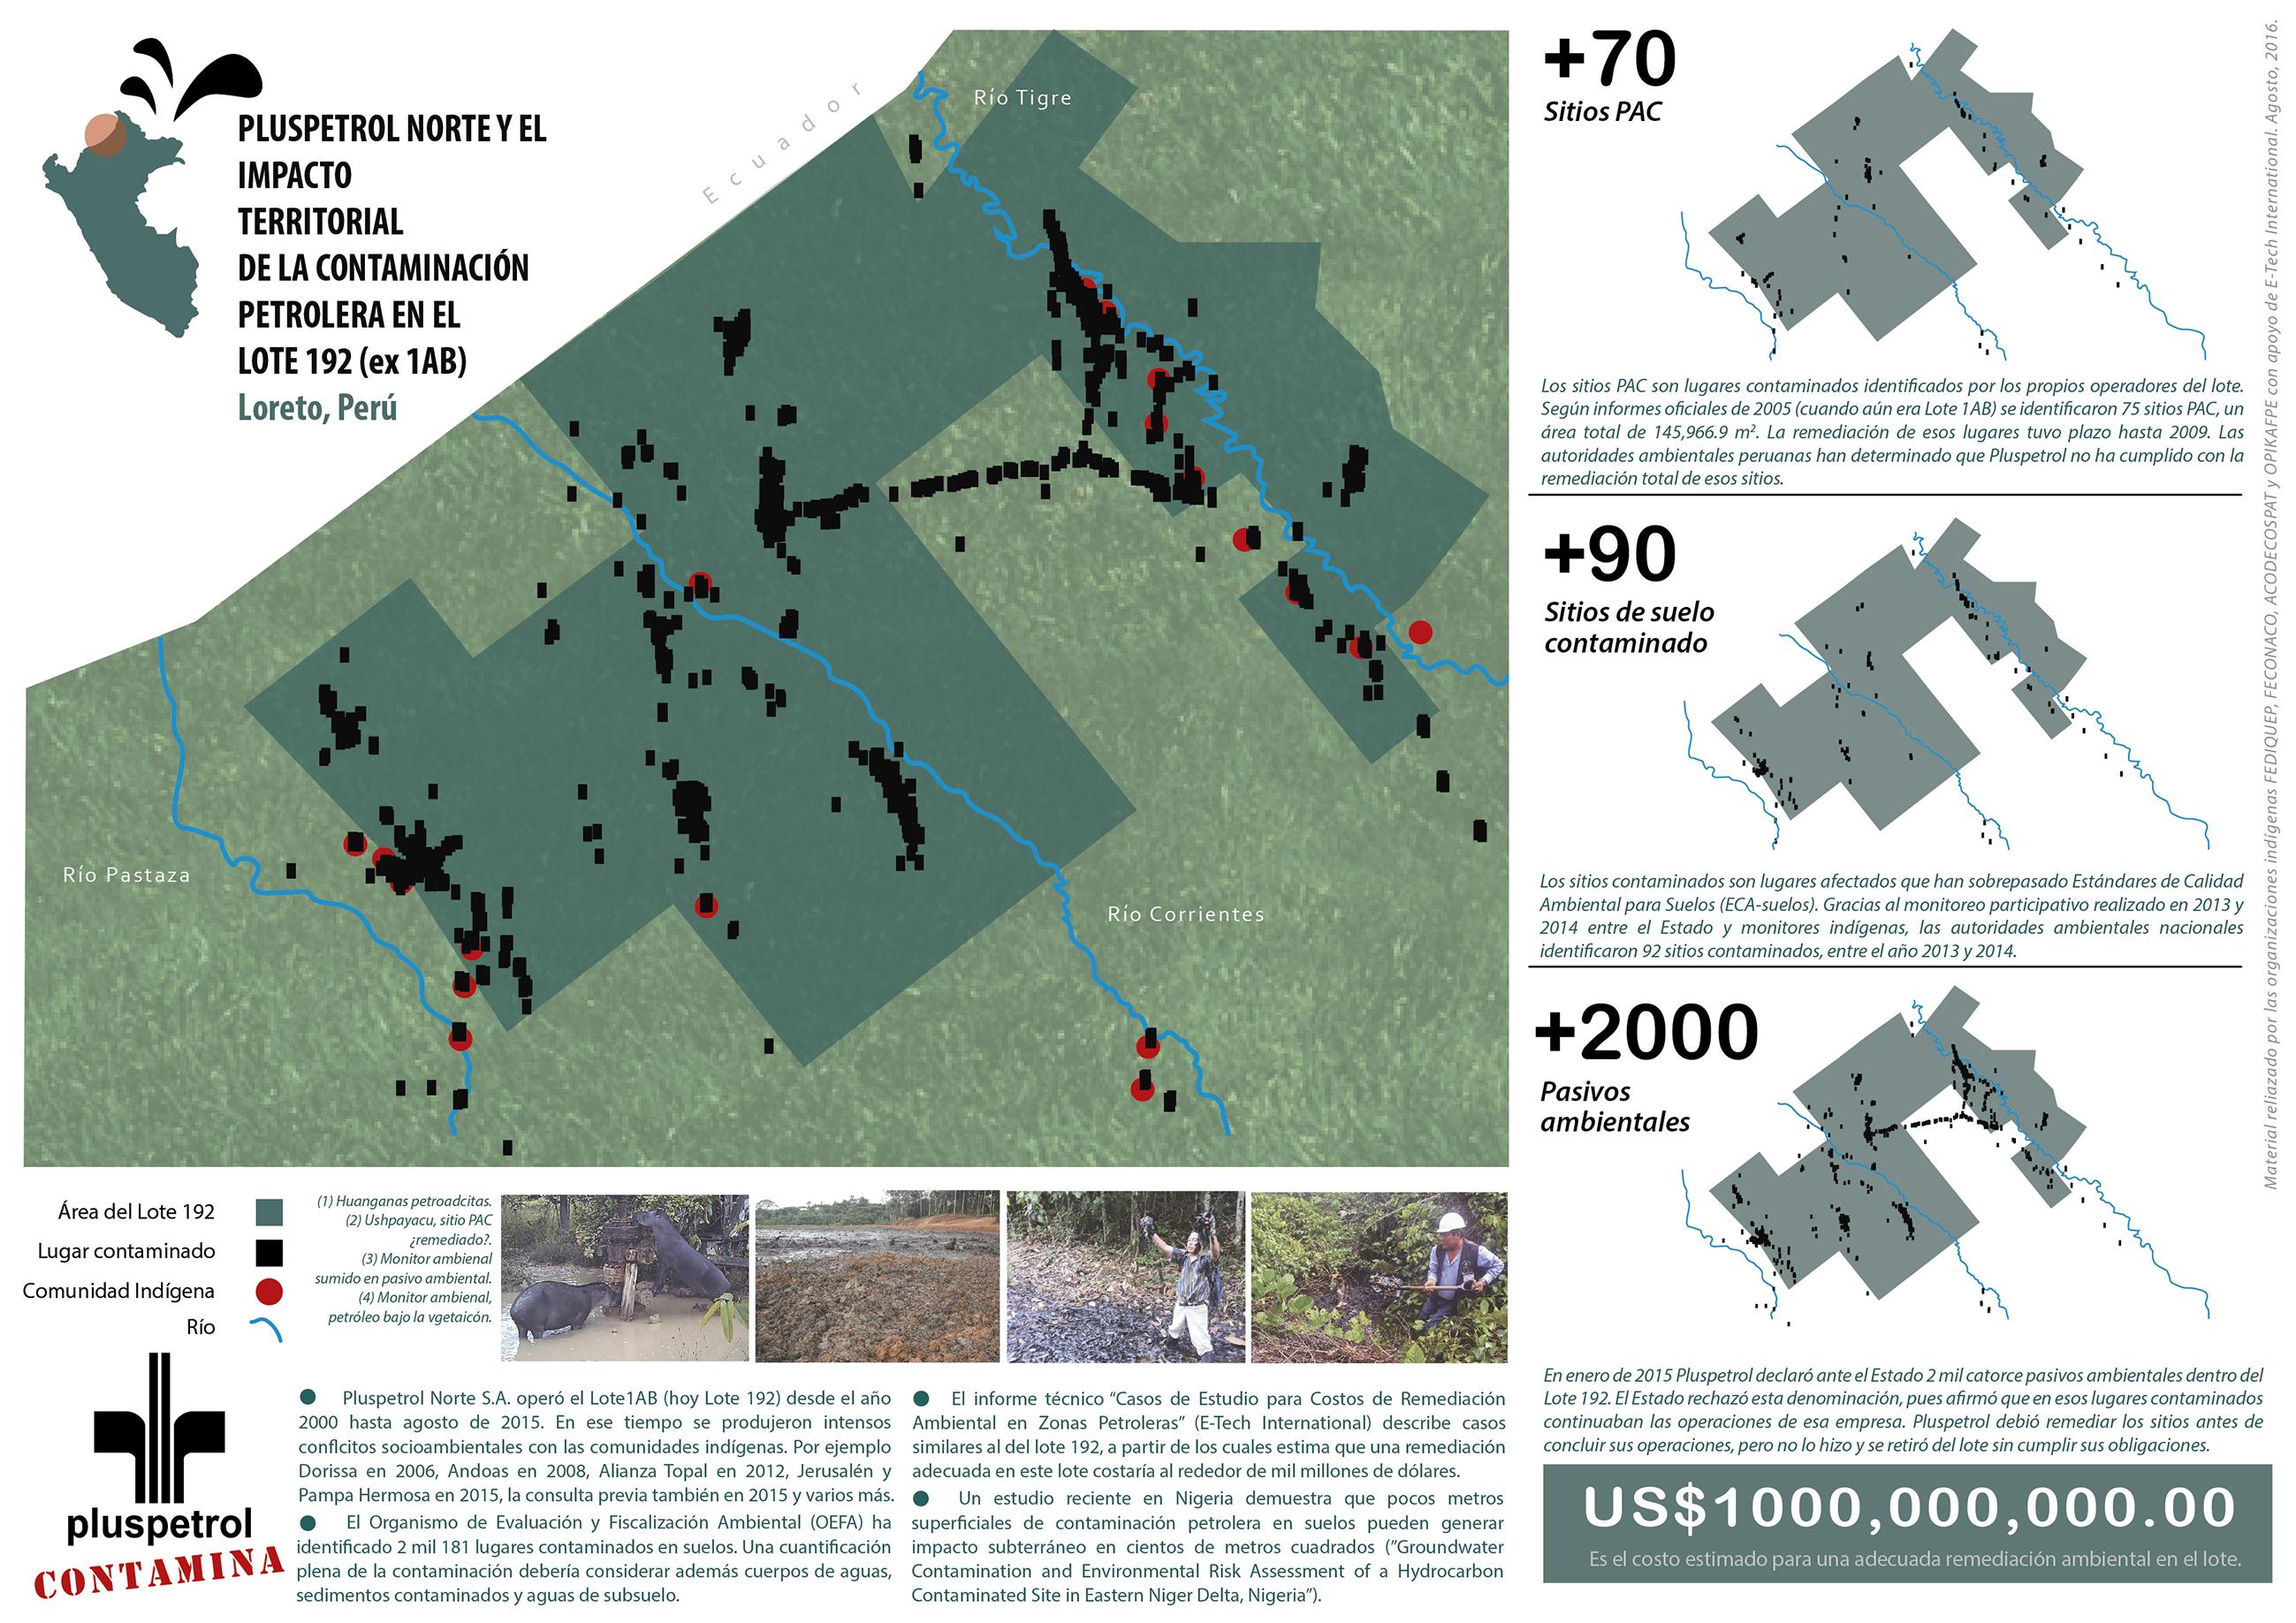 infografia_impactos_petroleros_l192_w.jpg